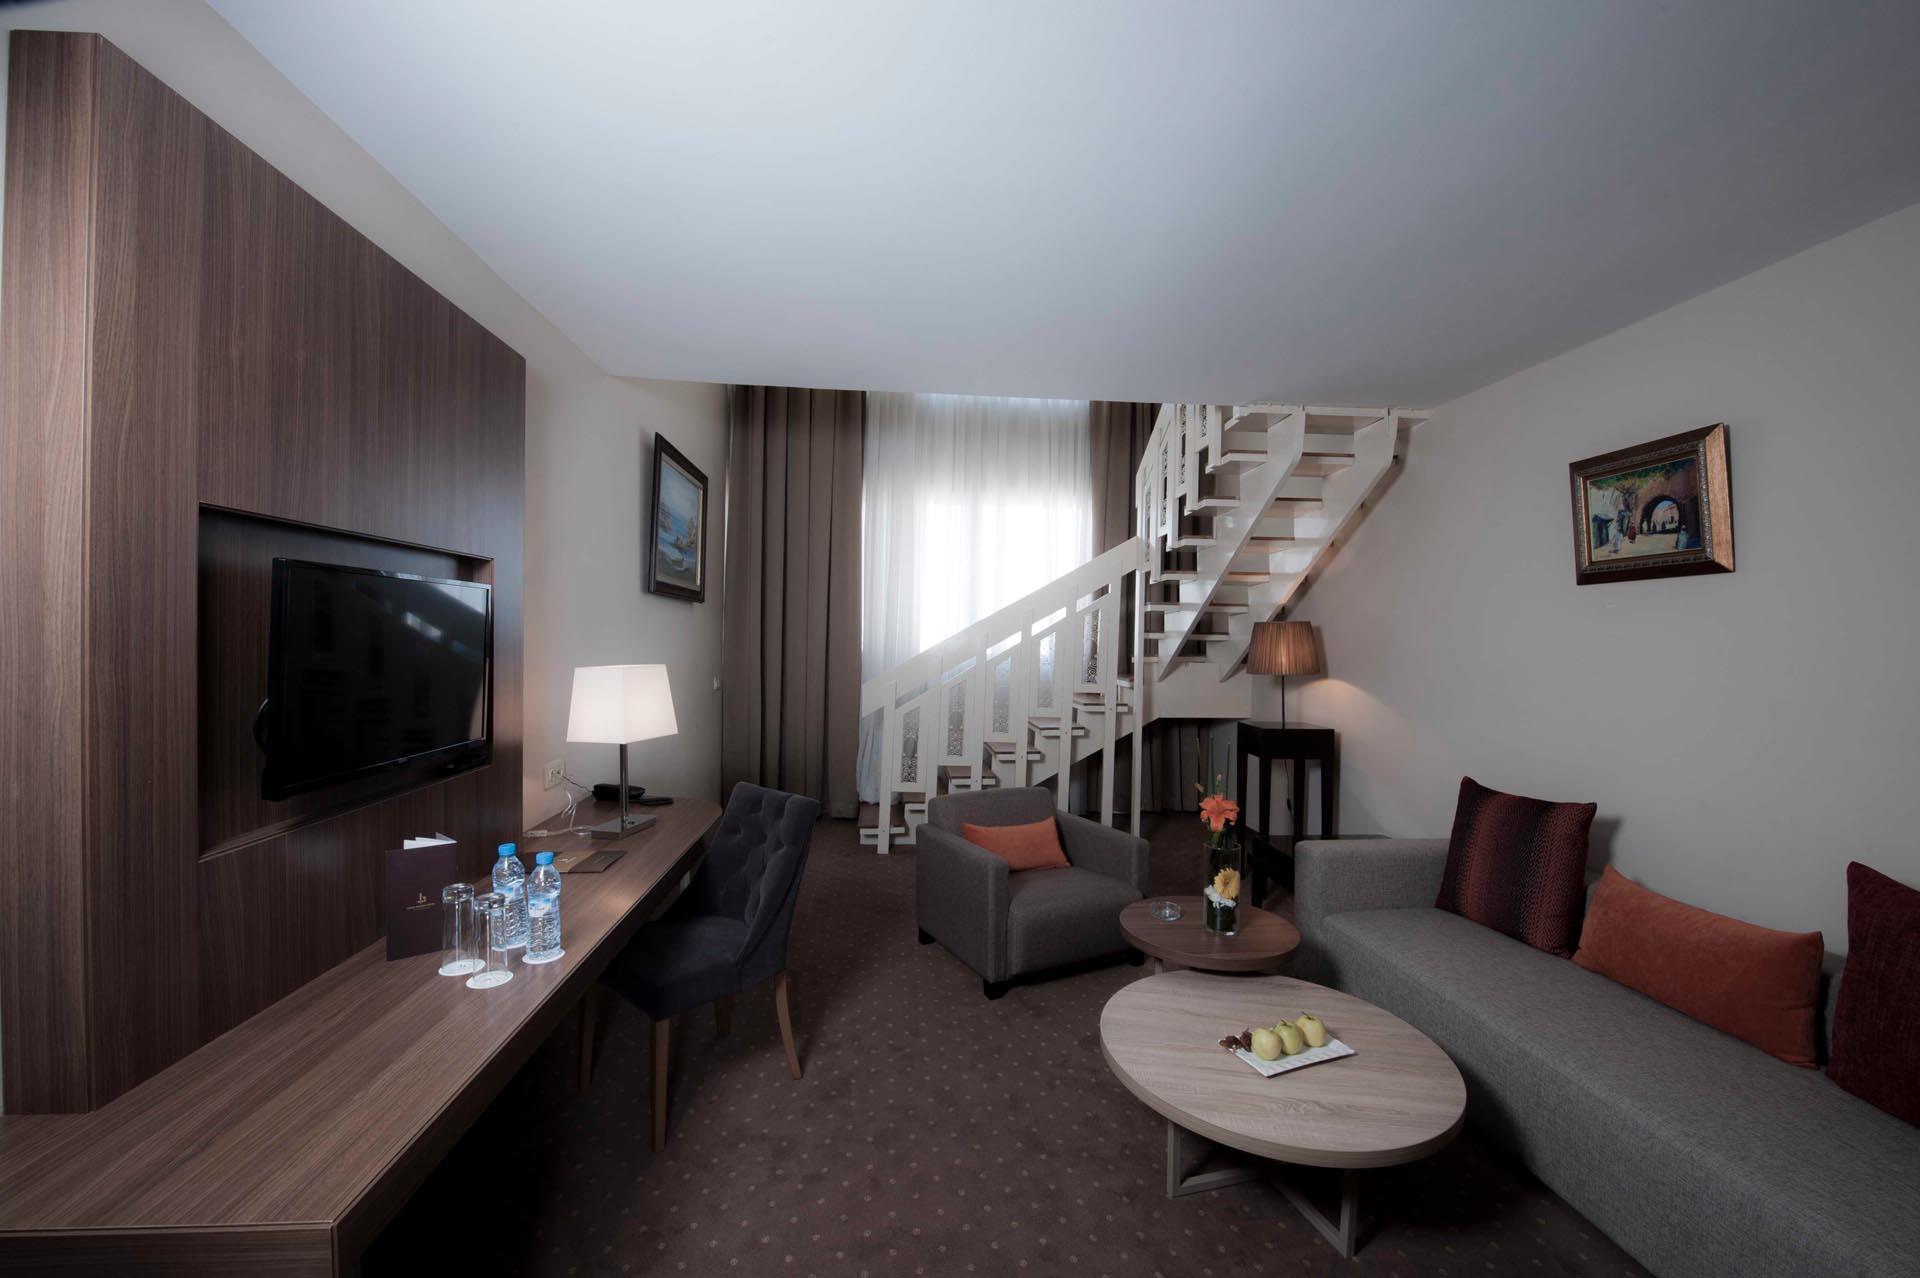 Accommodation at Kenzi Basma Hotel in Casablanca, Morocco